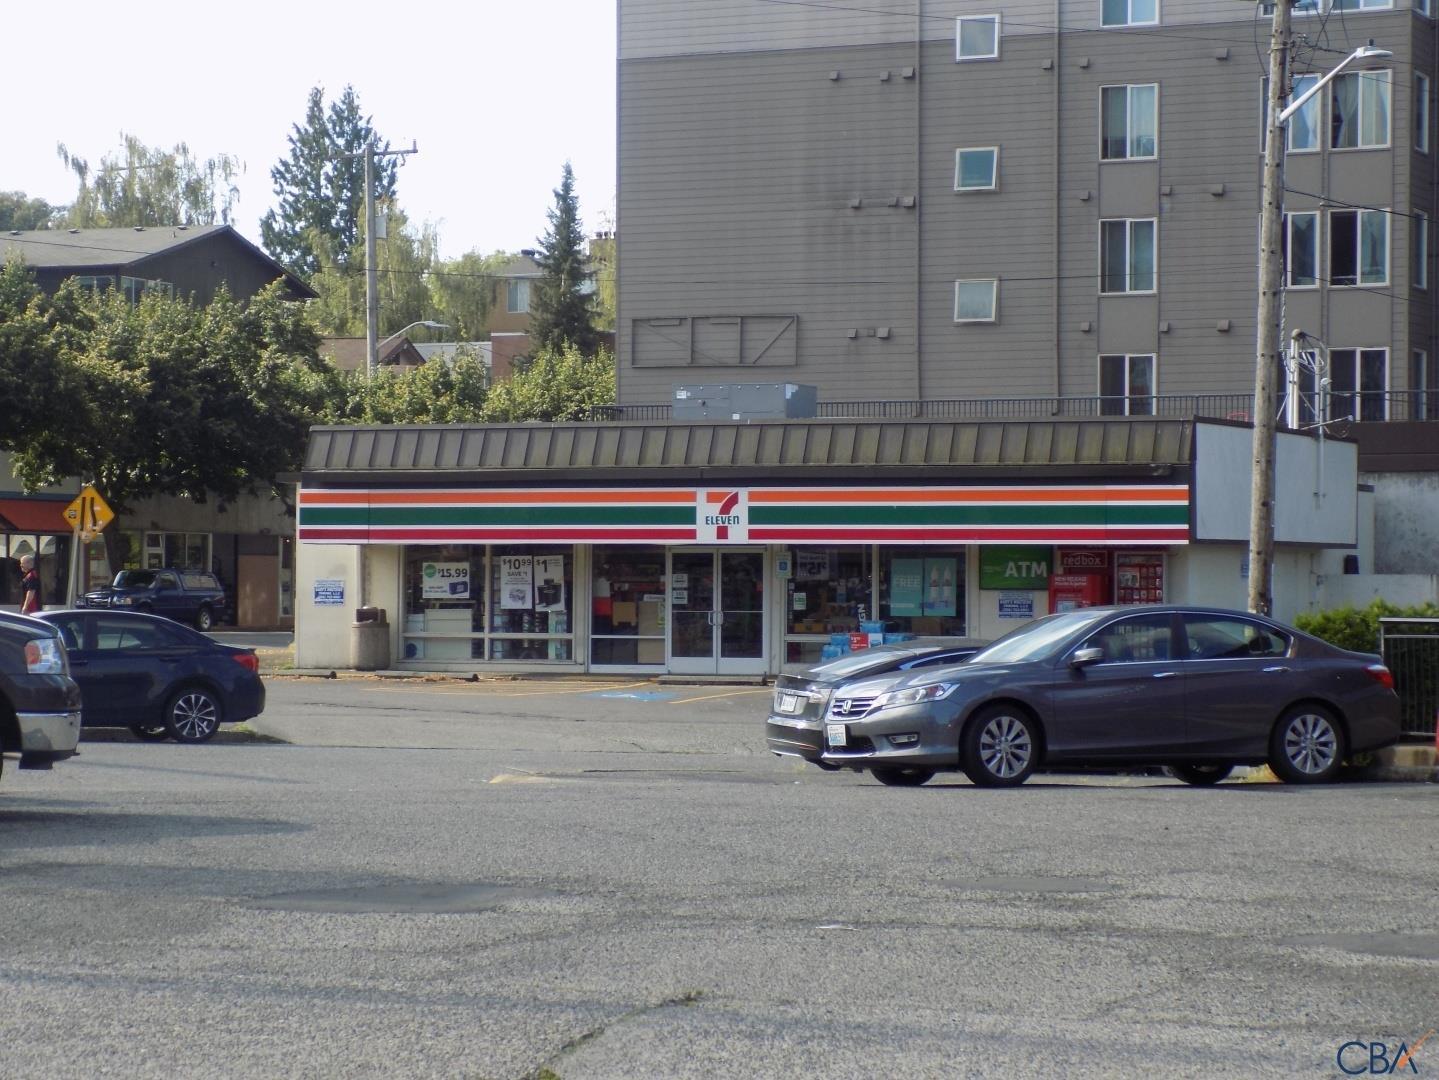 West Seattle Junction 7-11